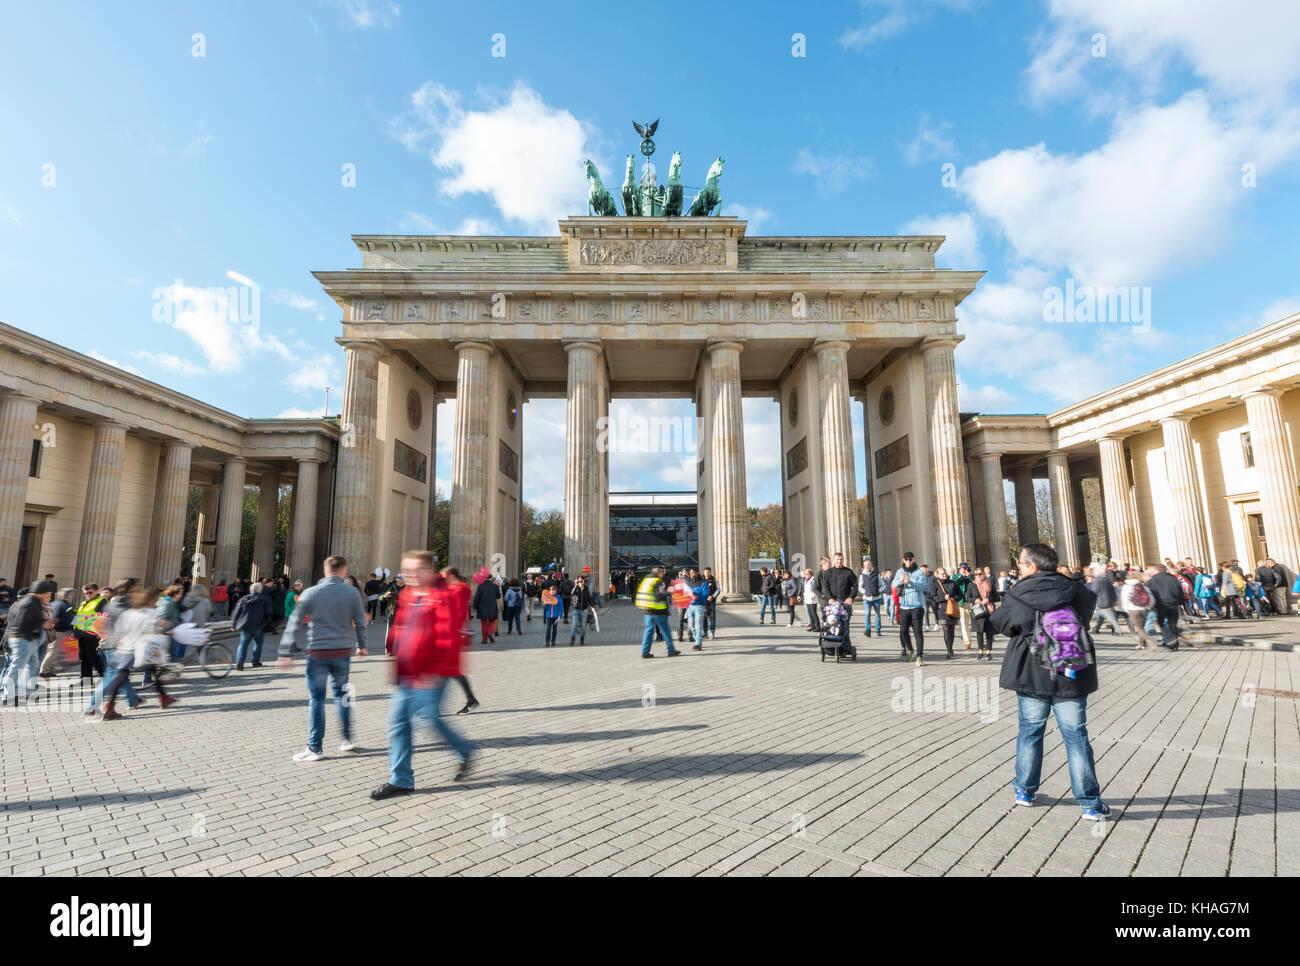 People run across the square at Brandenburg Gate, Berlin, Germany - Stock Image